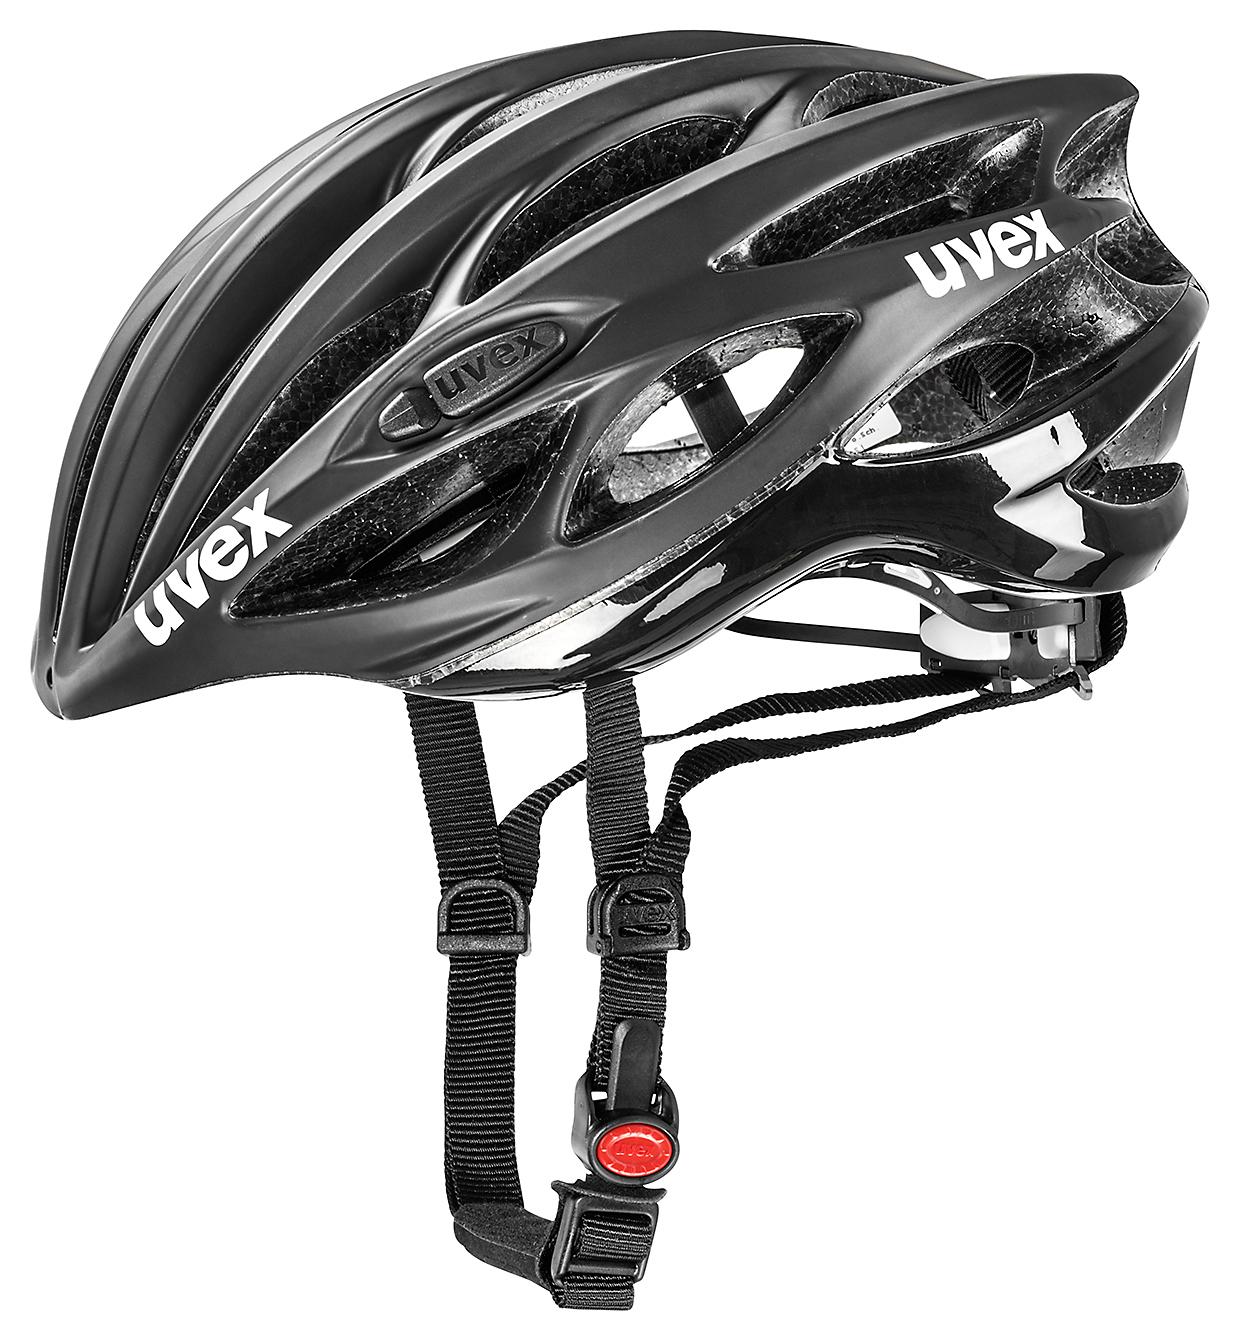 UVEX RACE 1, BLACK MAT-SHINY 2015 55-59 cm